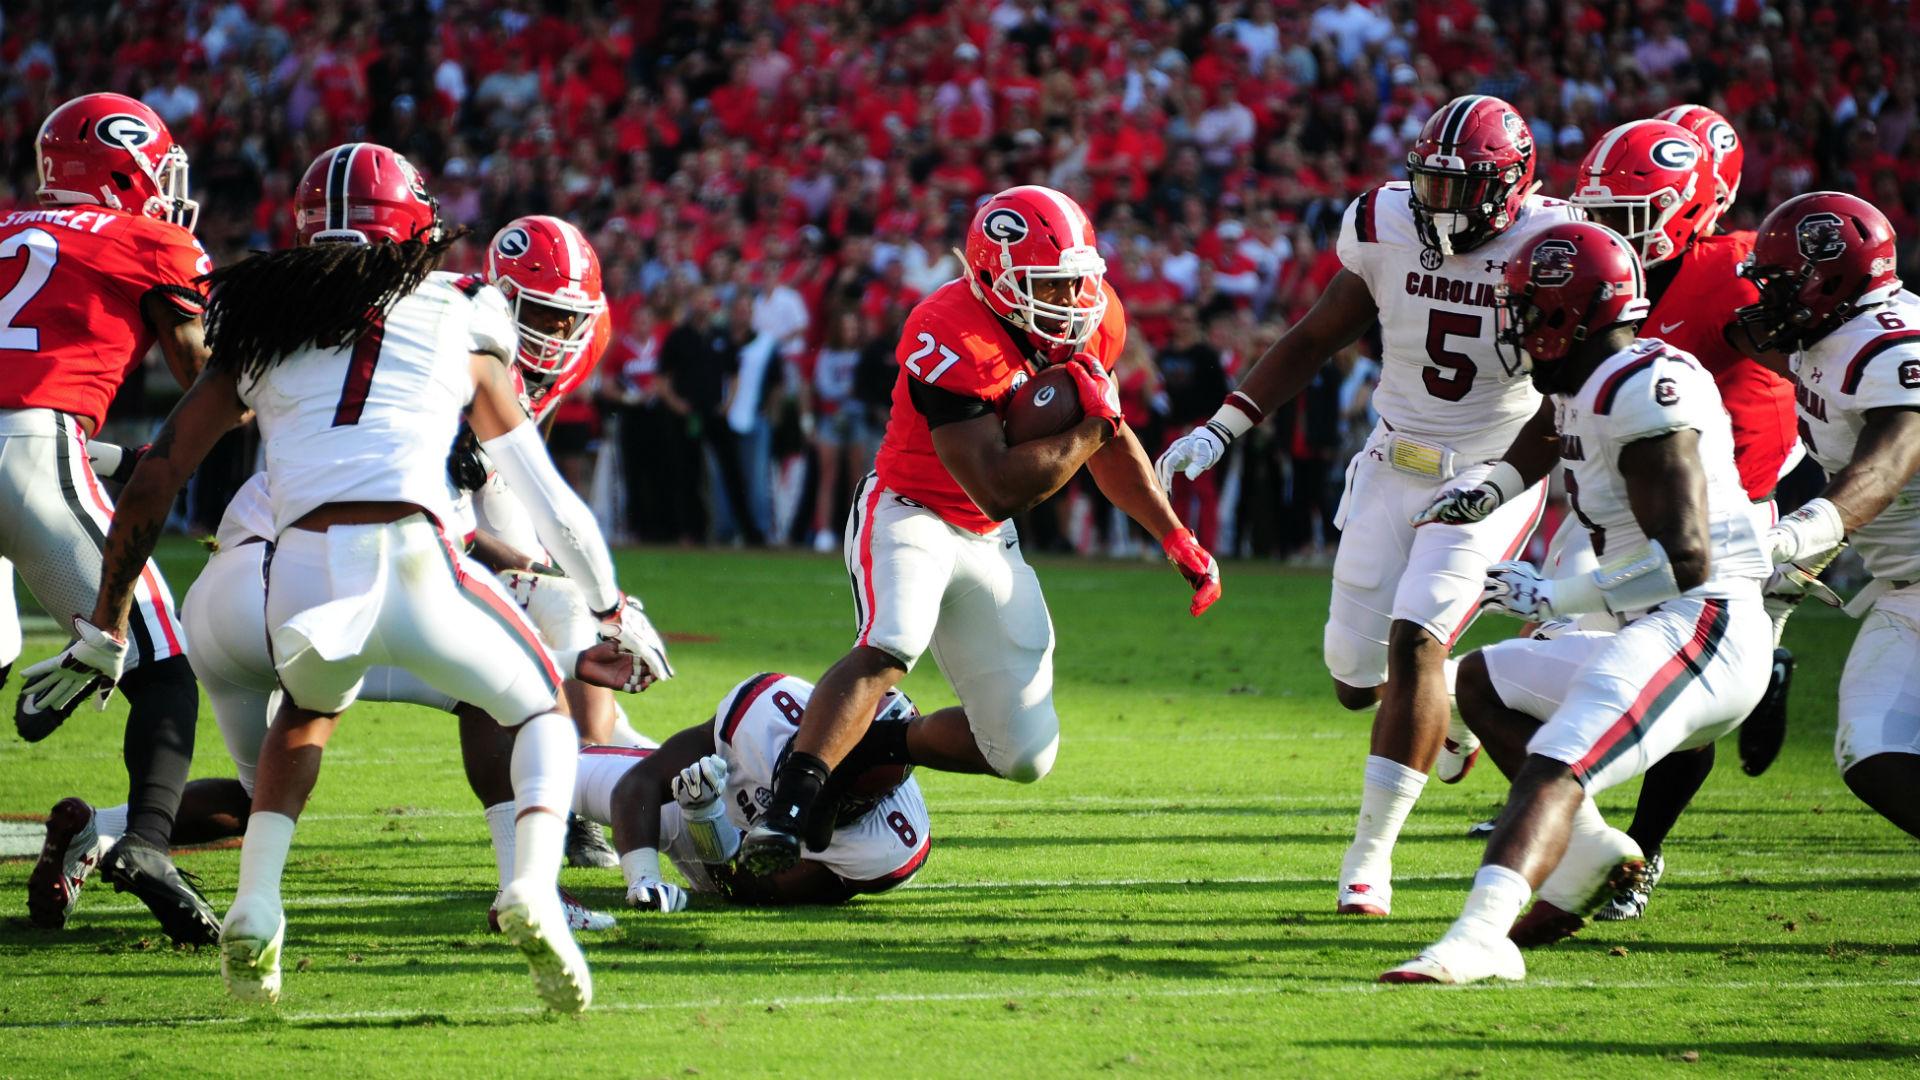 South Carolina Vs Georgia Score Highlights Bulldogs Blow Out Gamecocks In Sec Opener